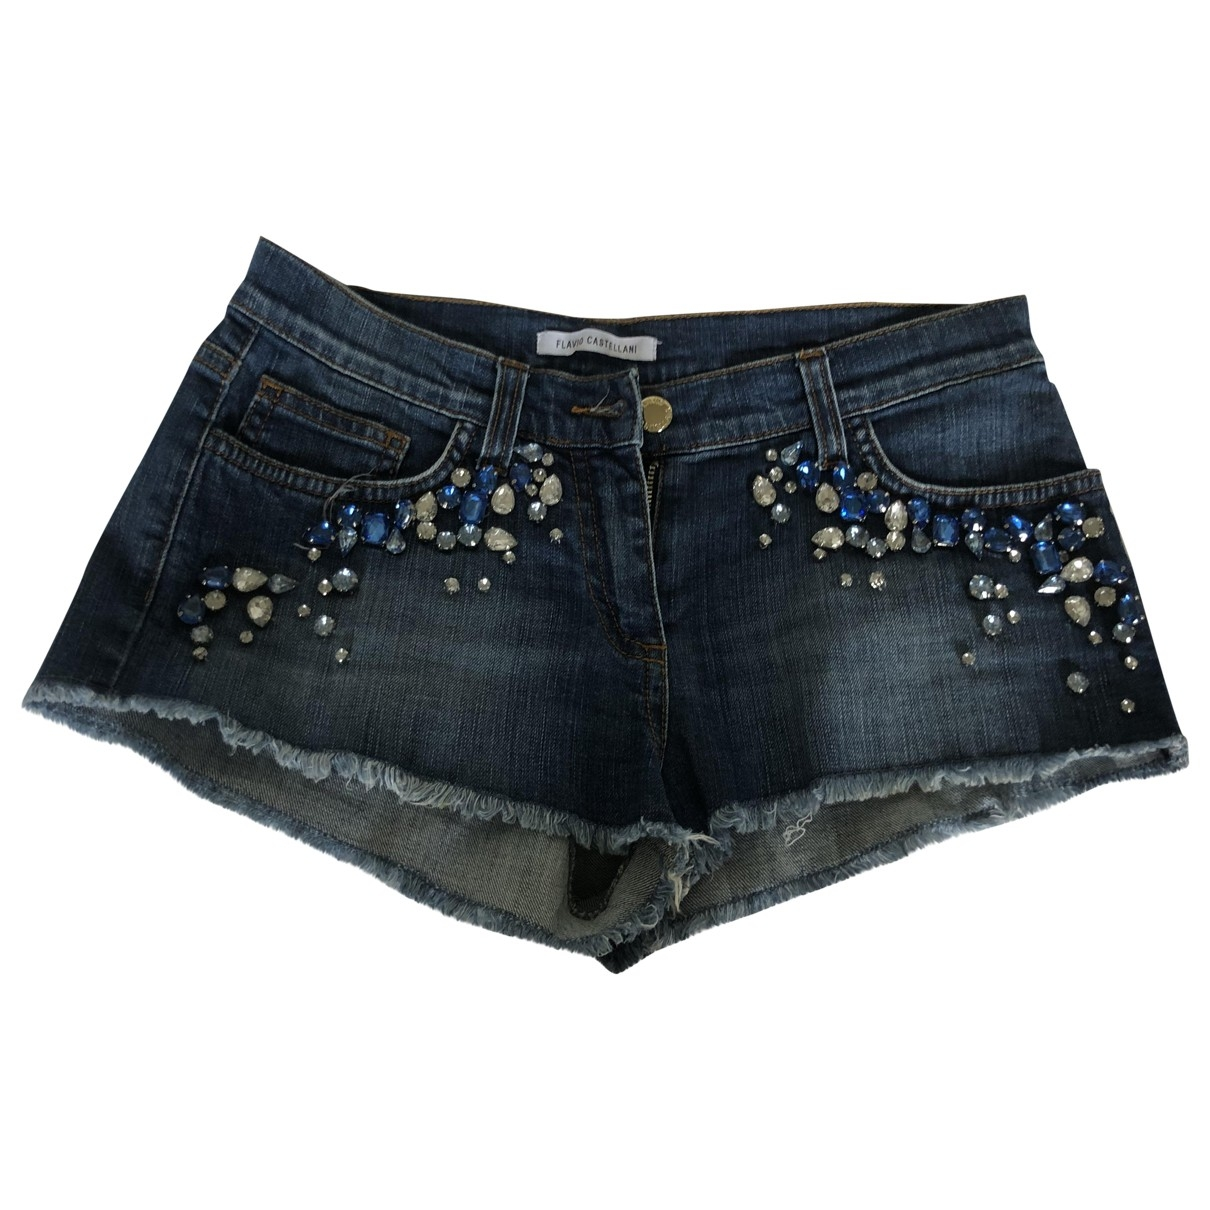 Flavio Castellani \N Blue Denim - Jeans Shorts for Women 40 IT